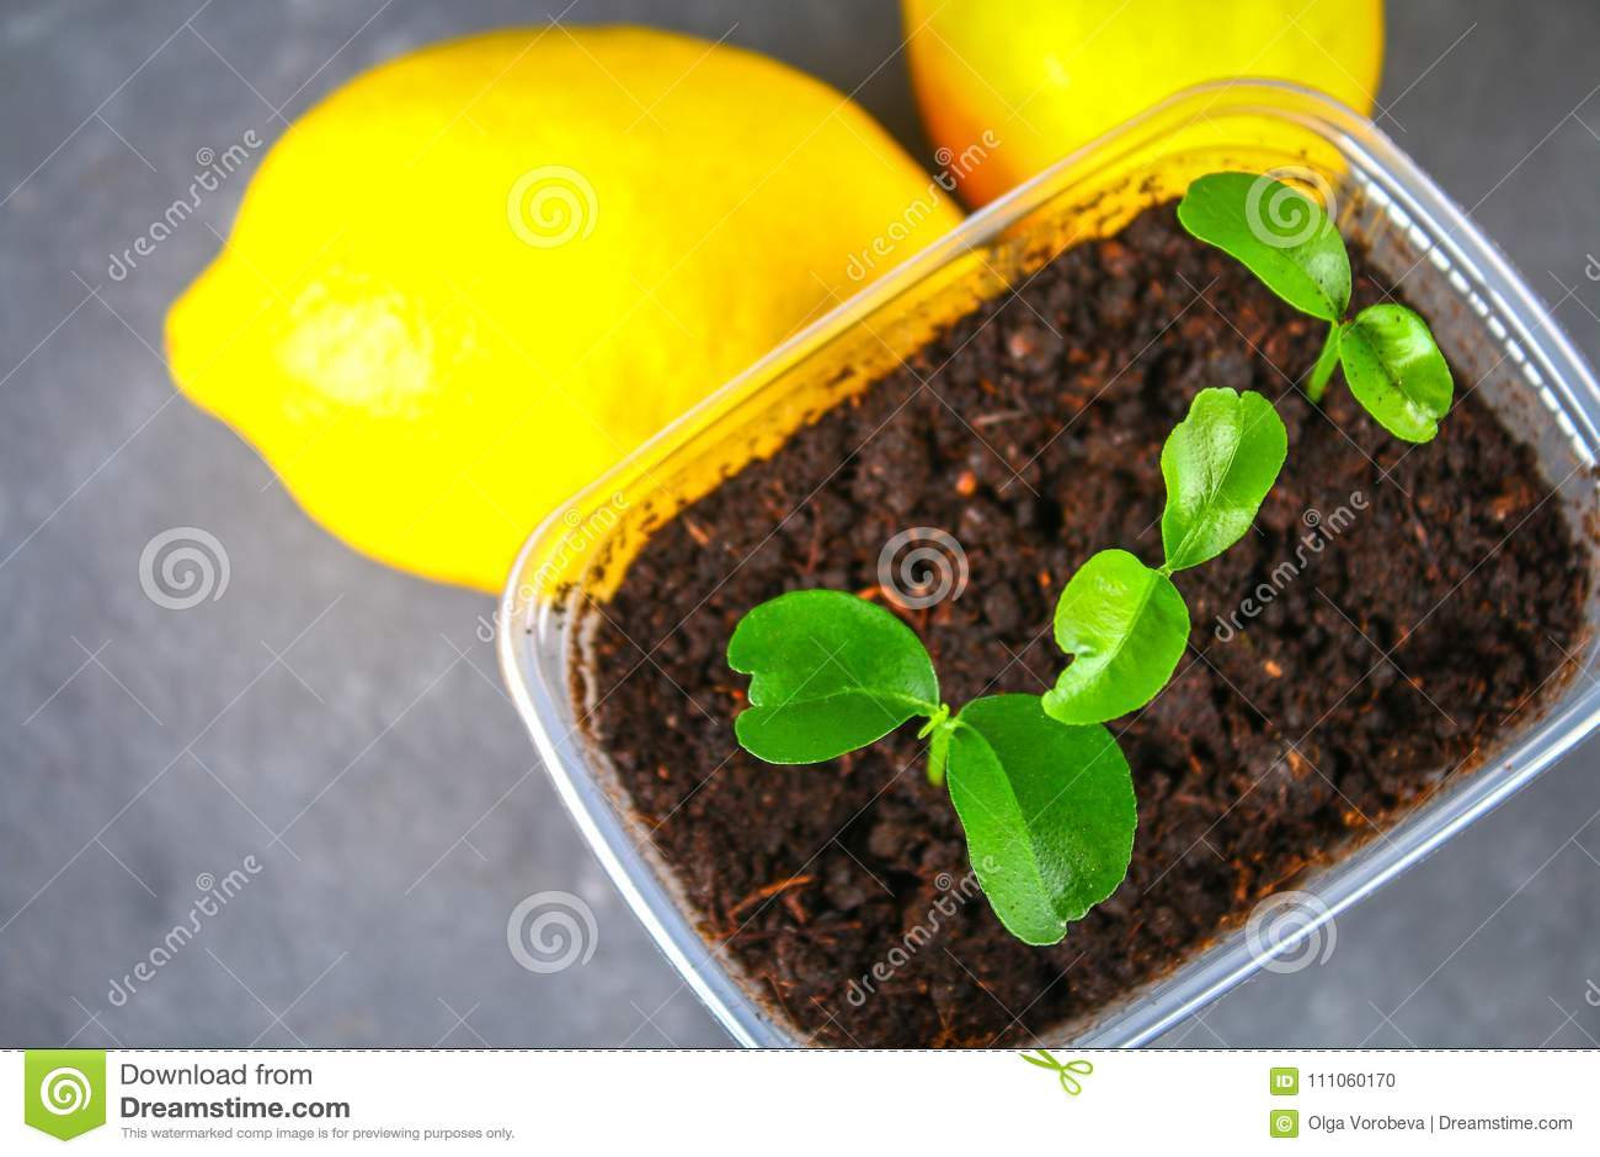 росток лимона фото